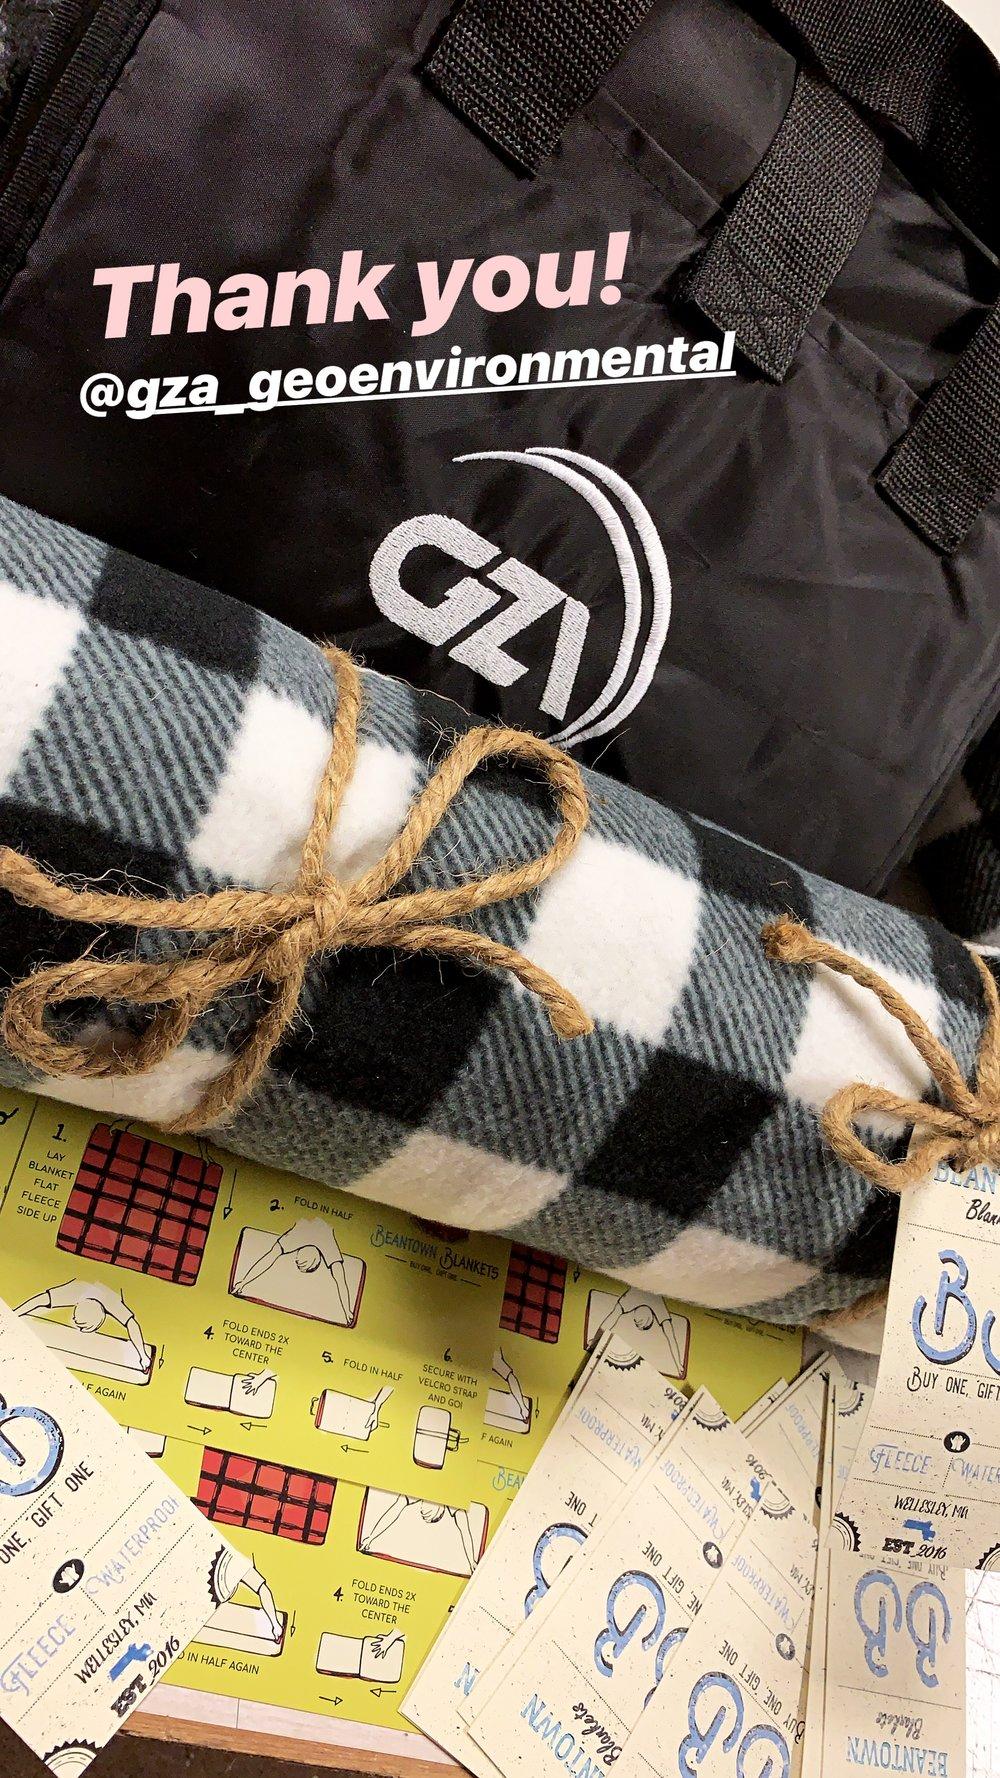 IMG-0743.JPG